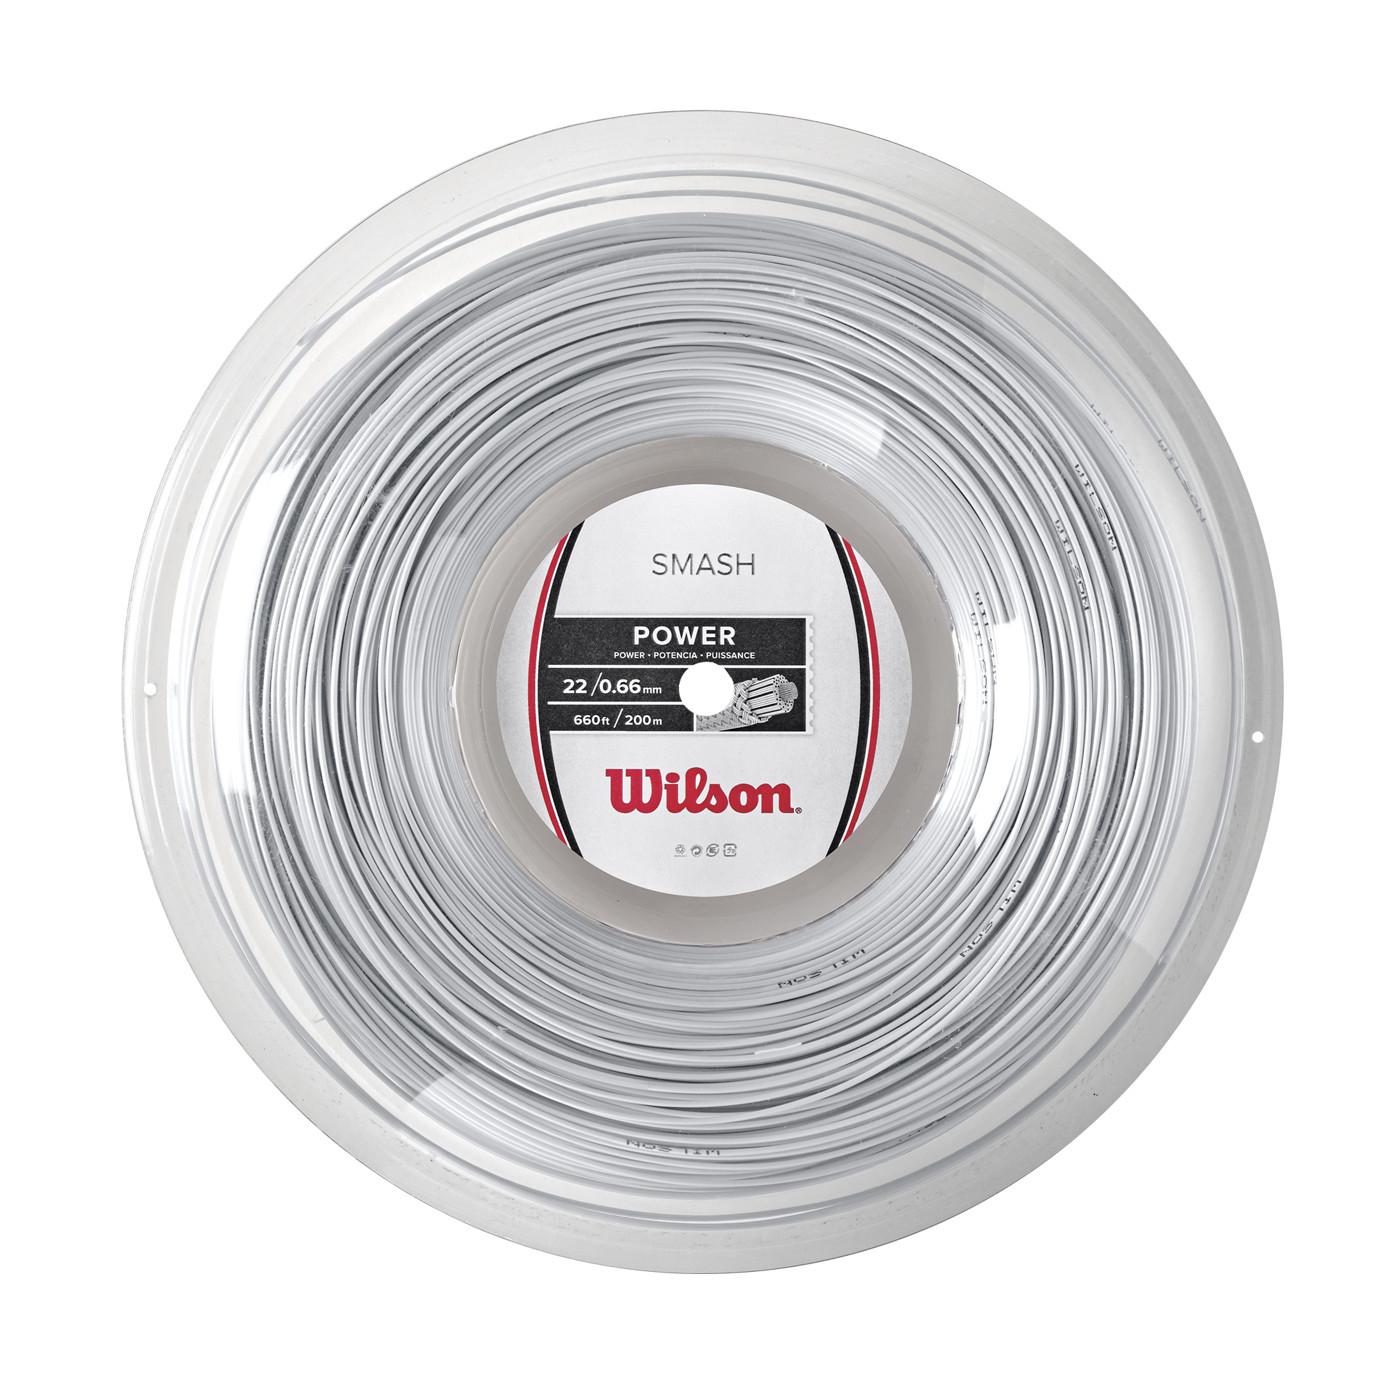 WILSON SMASH 66 200M REEL WHITE